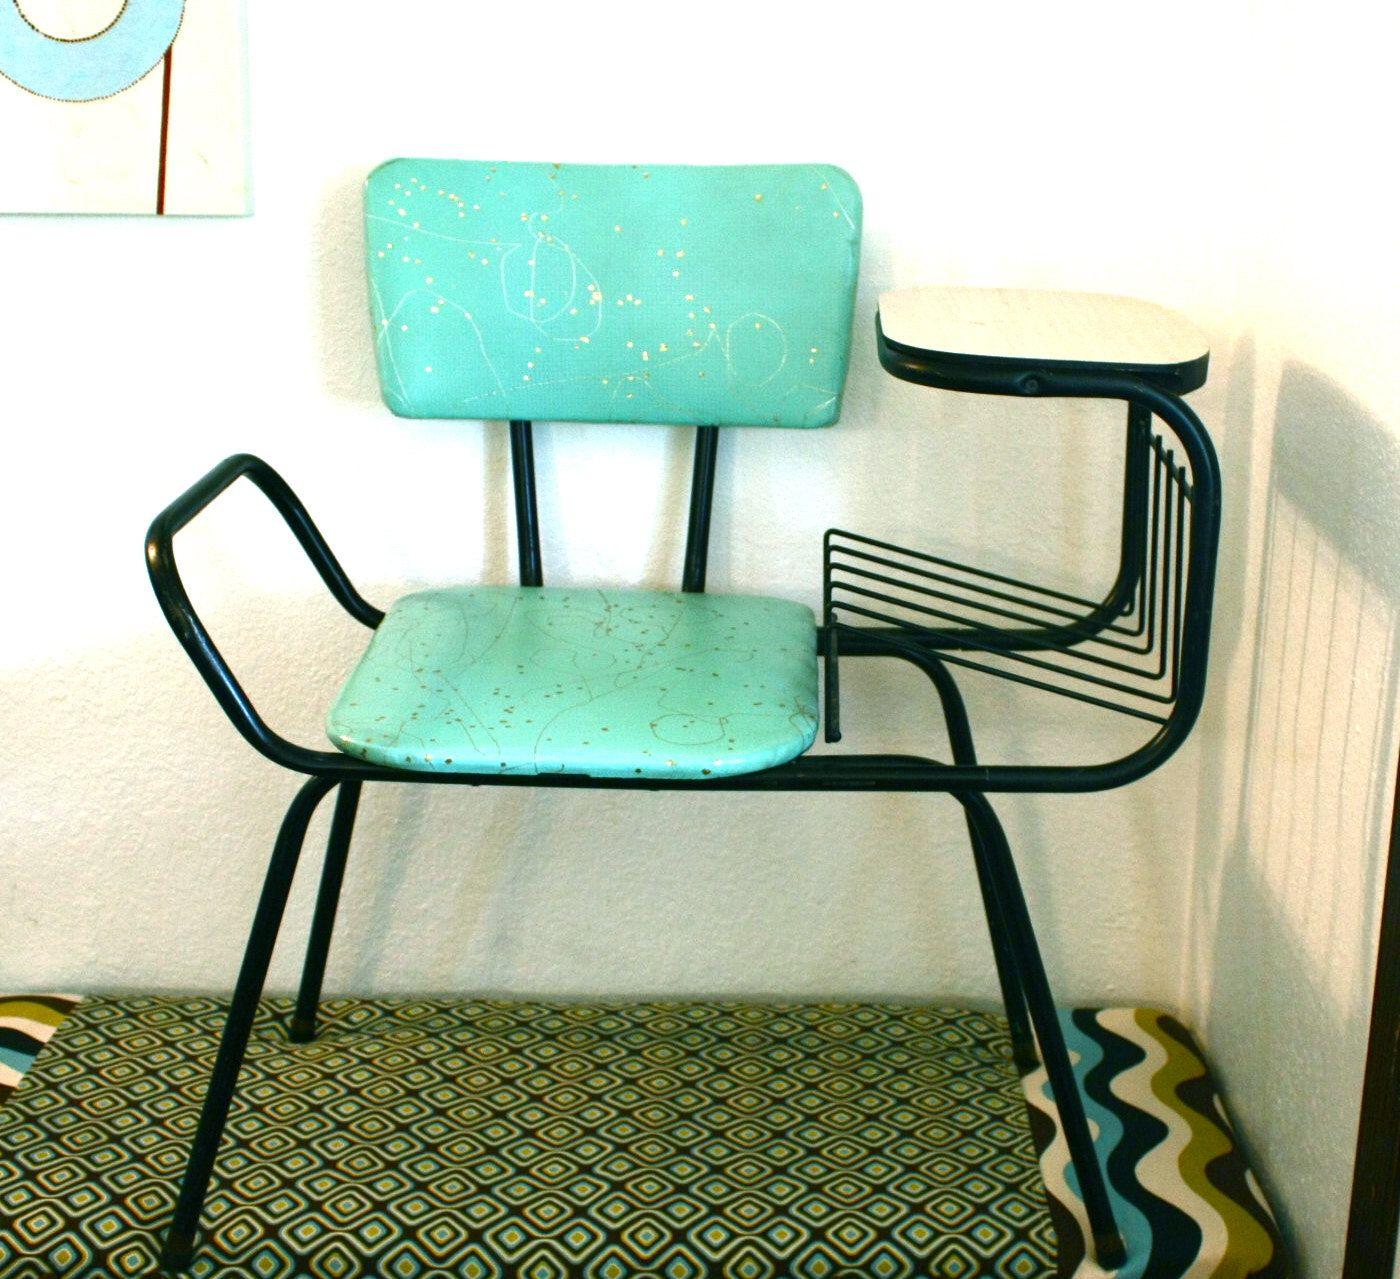 telephone bench chair phone book holder gossip chair telephone  - telephone bench chair phone book holder gossip chair telephone seat